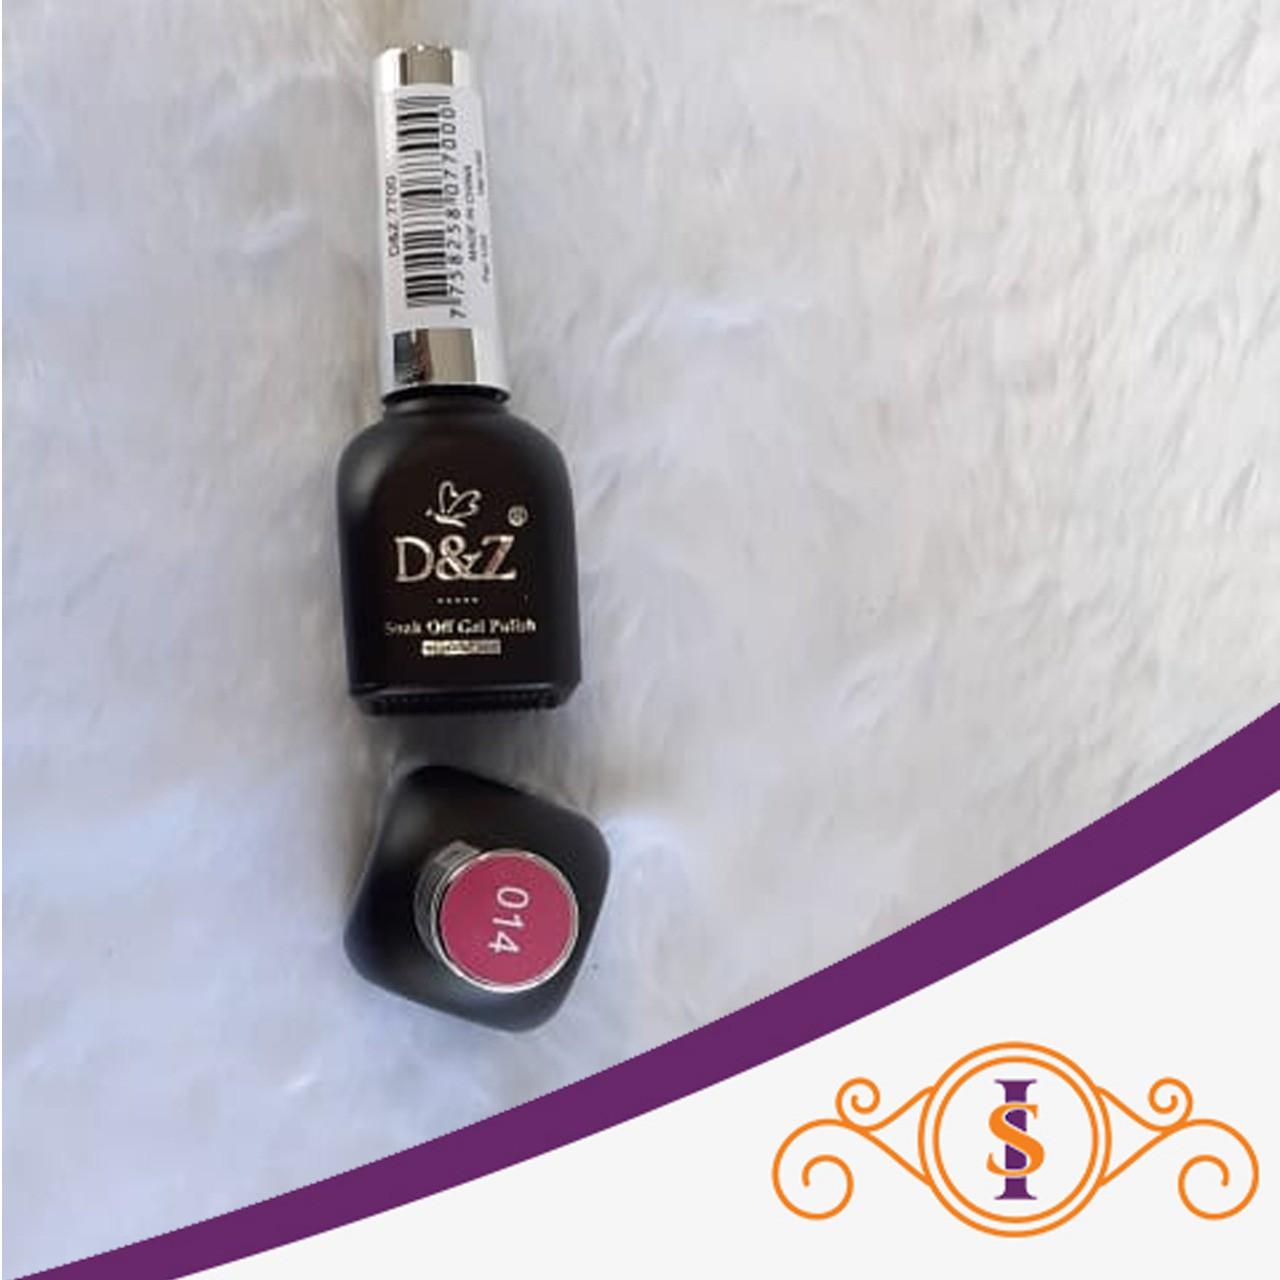 Esmalte em Gel D&Z 12ml - Soak Off Gel Polish - Cor 014